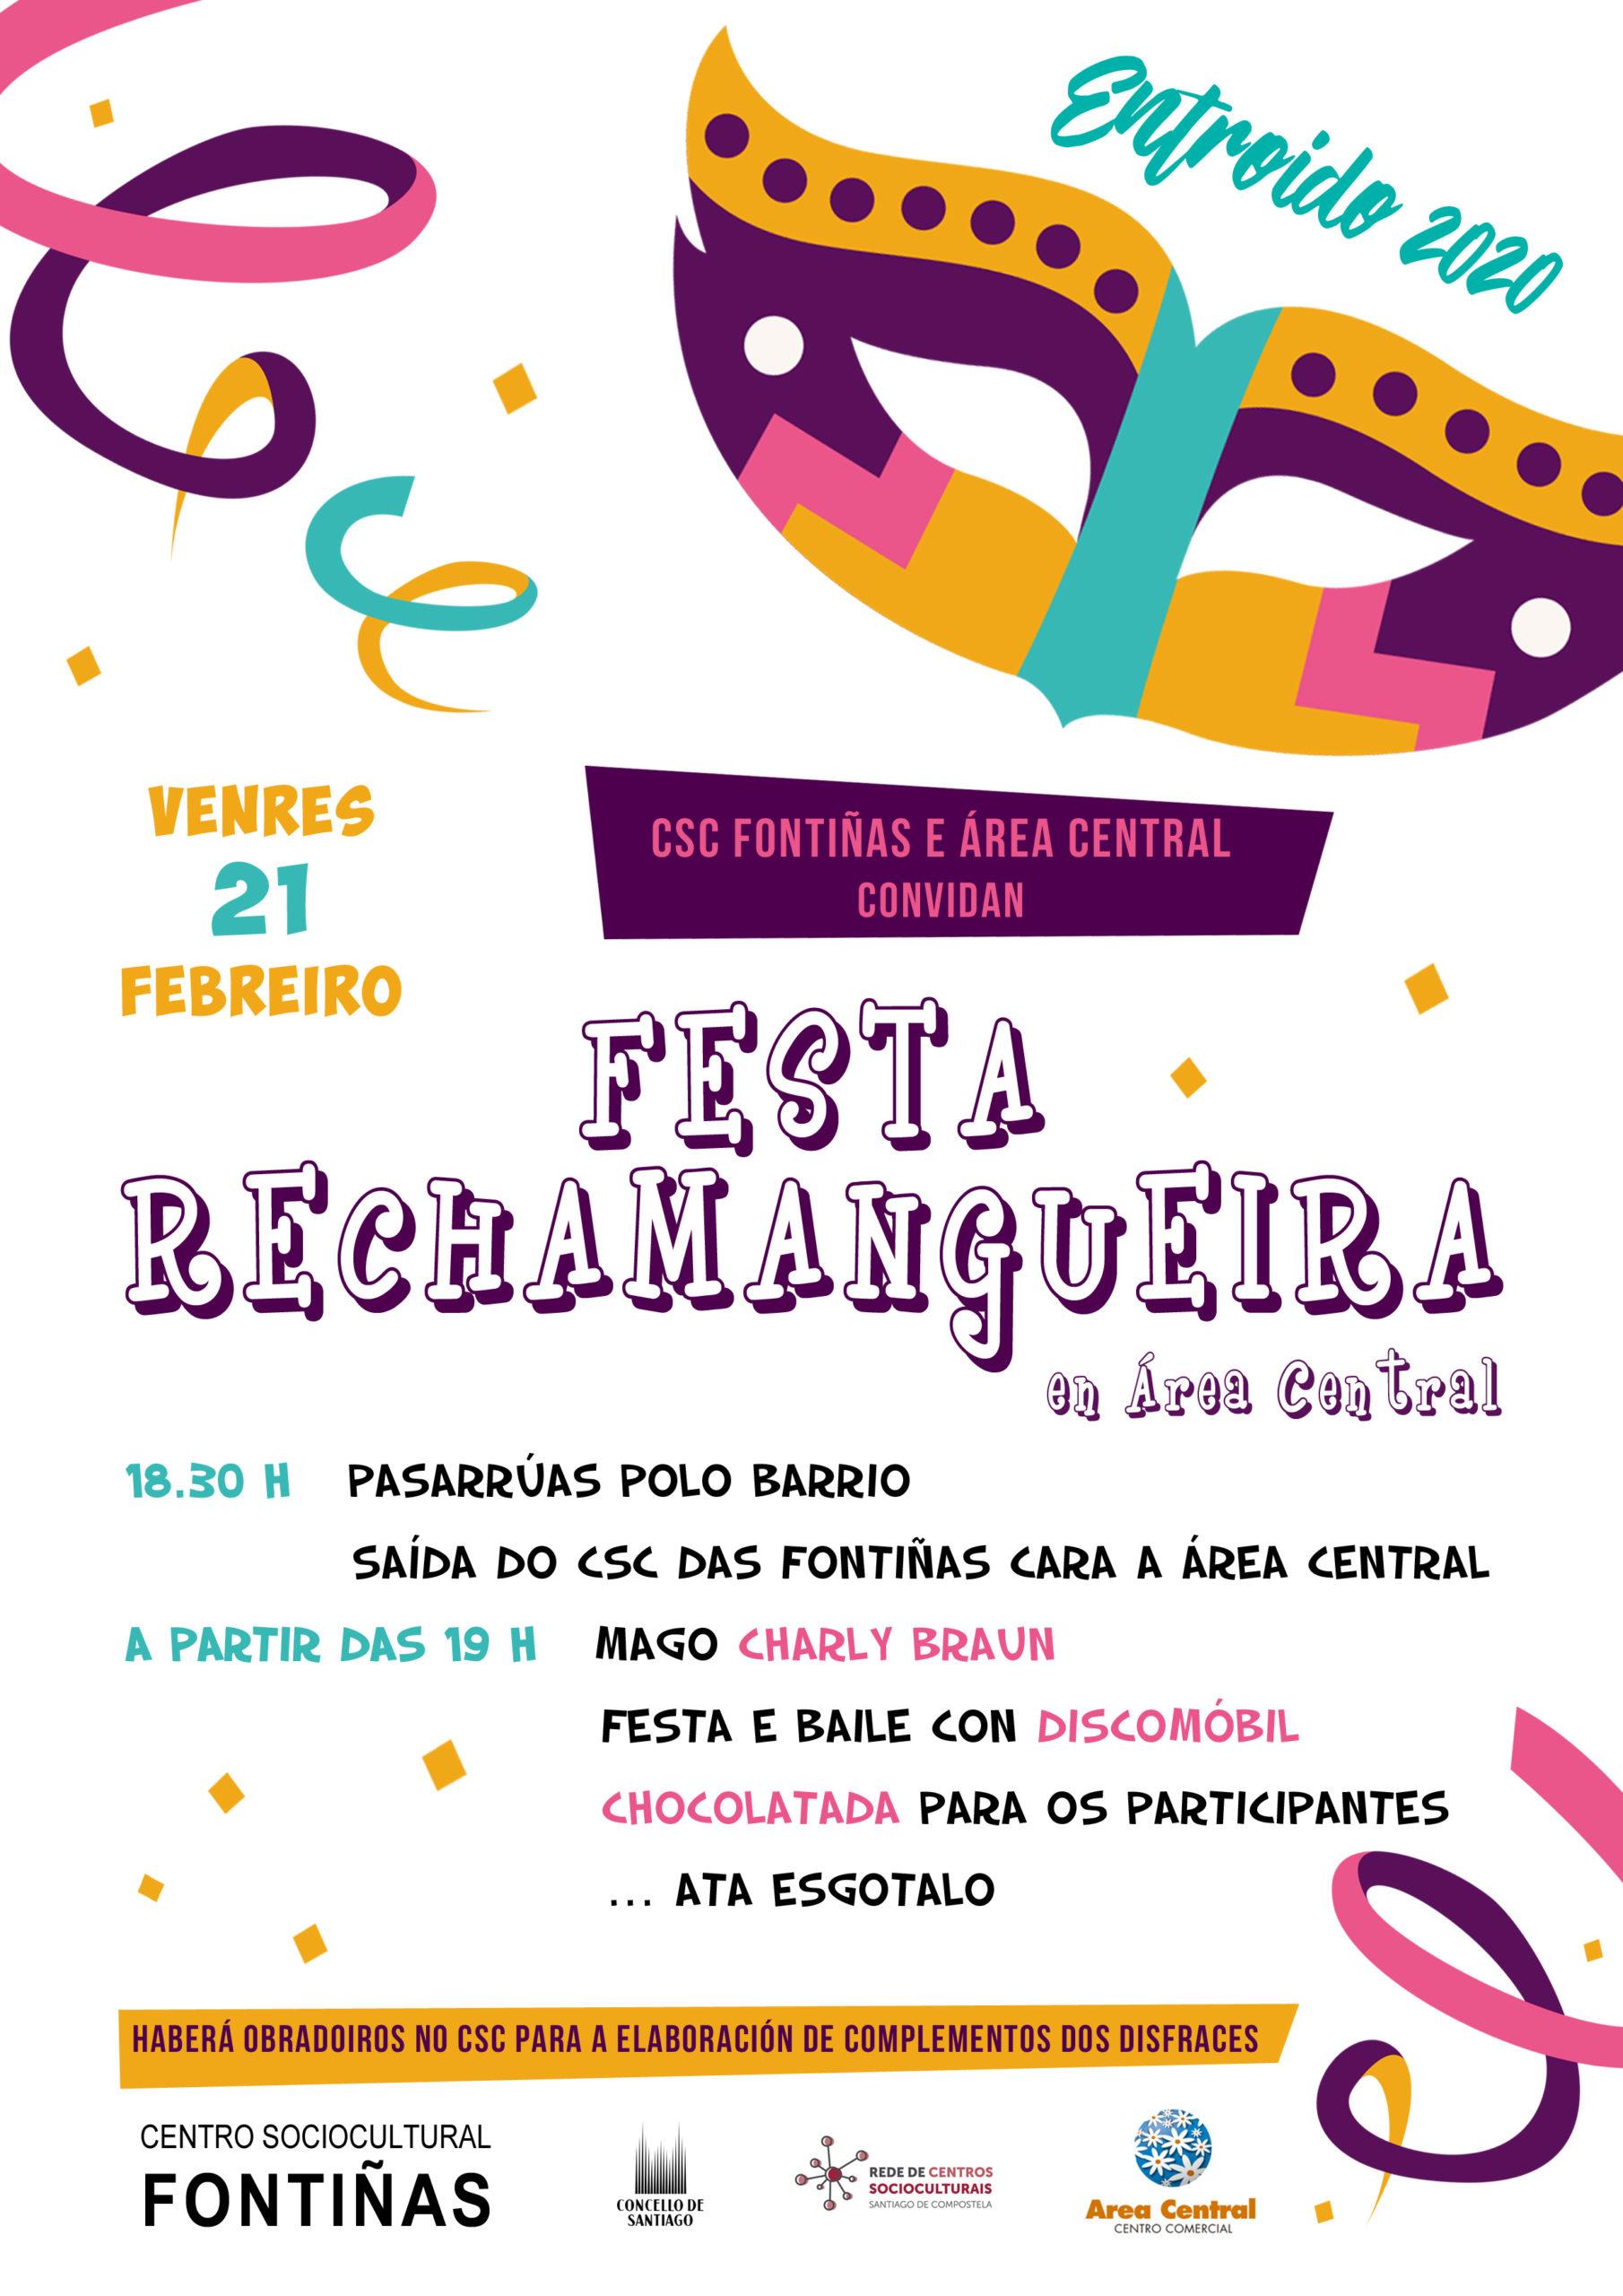 FESTA RECHAMANGUEIRA